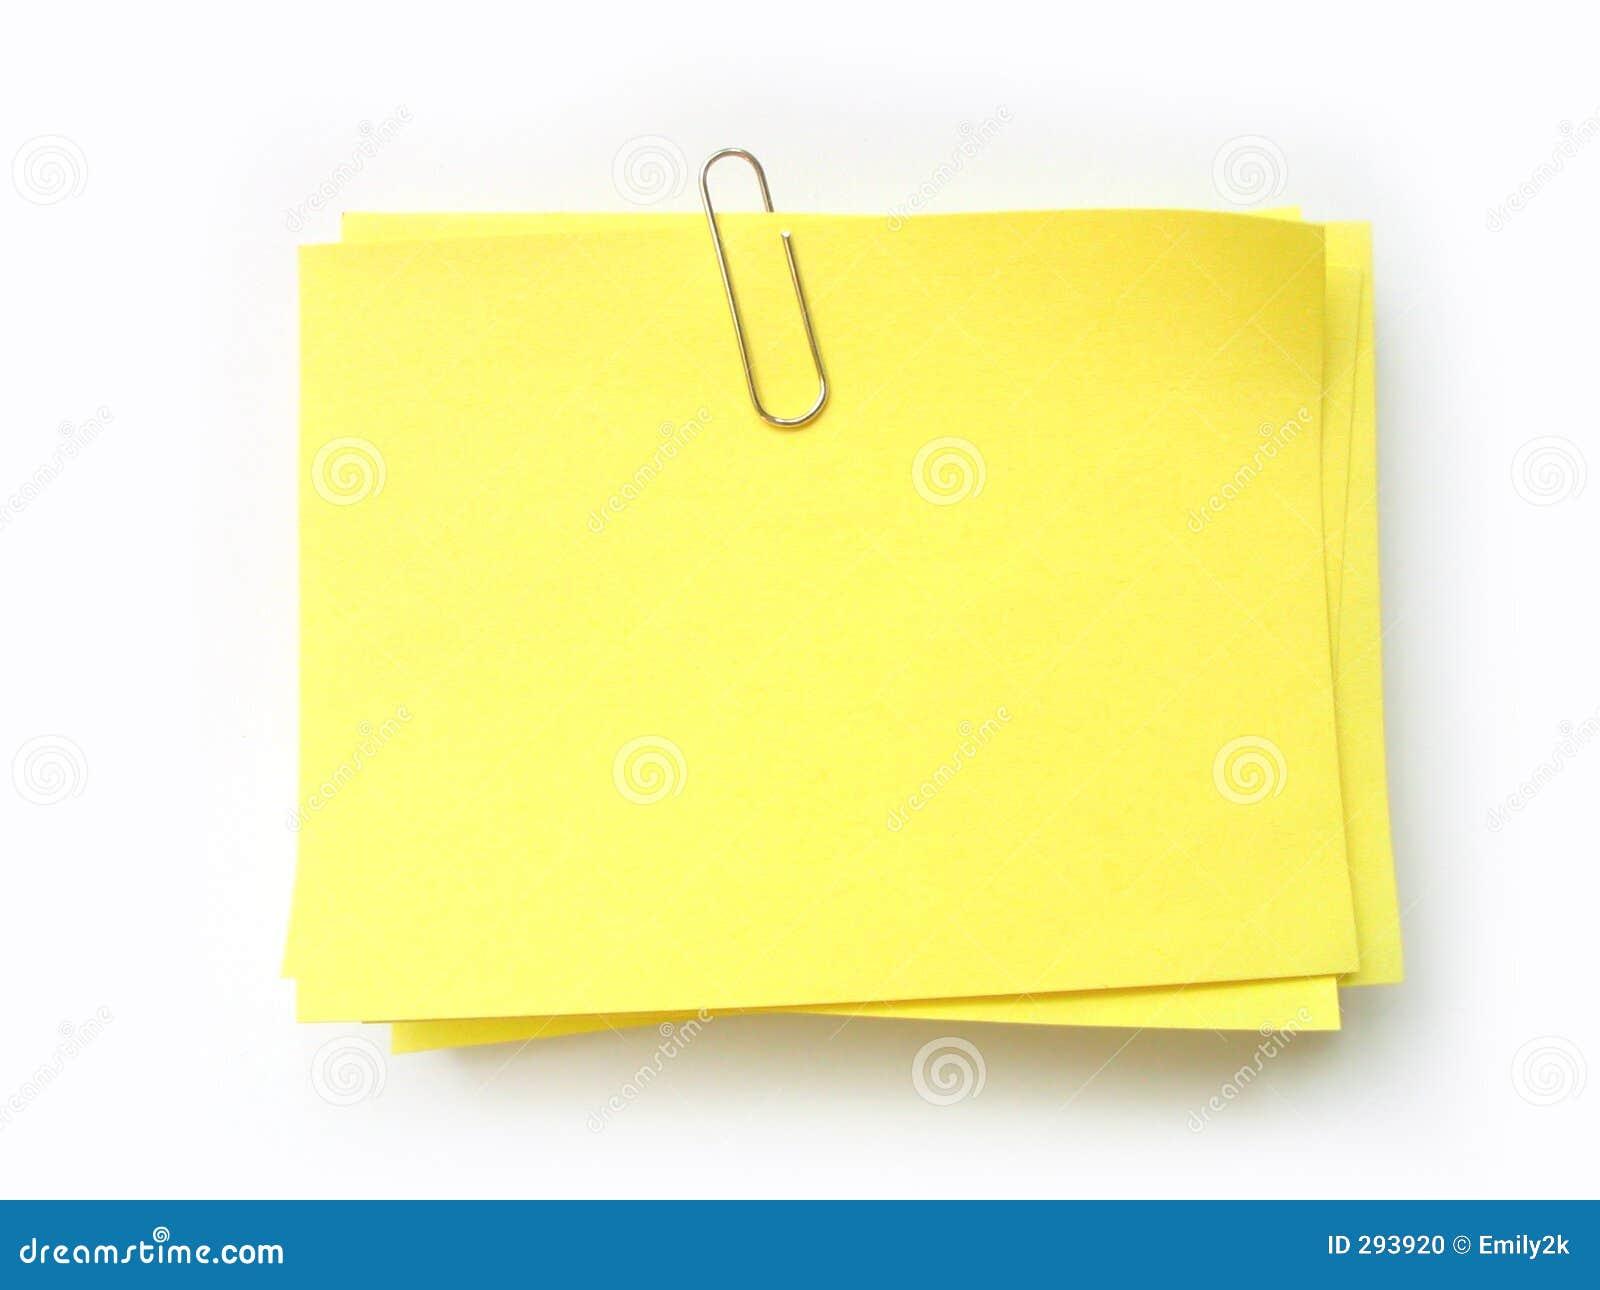 Write Note On It Stock Photo Image 293920